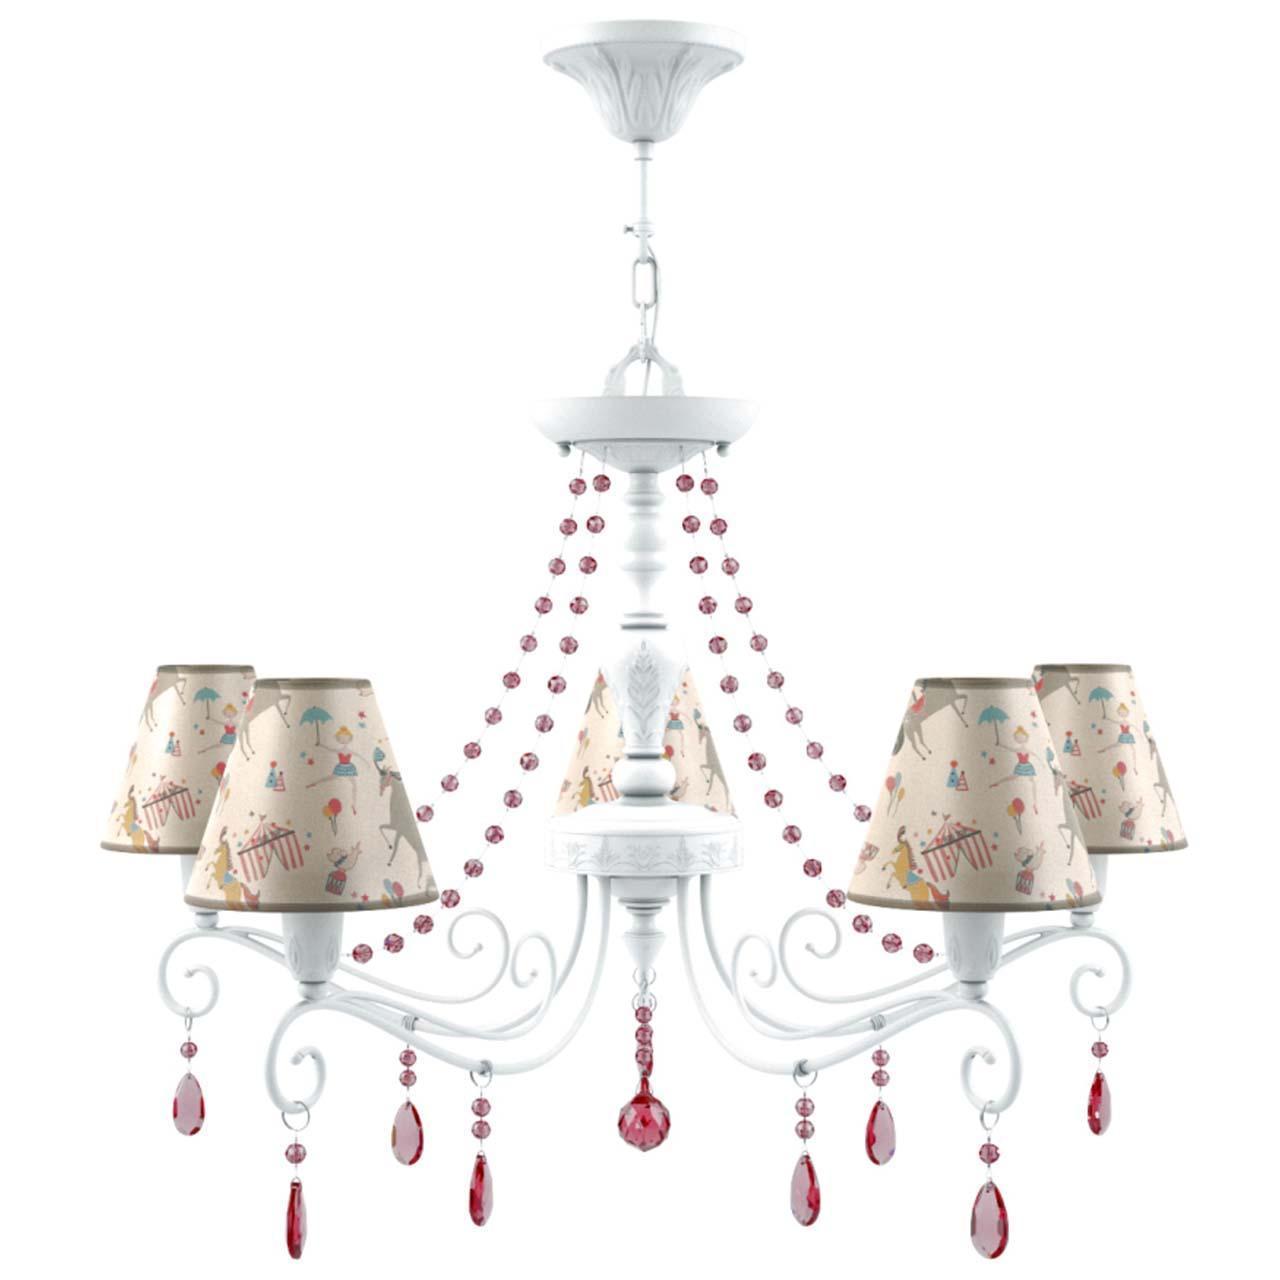 Подвесная люстра Lamp4you Provence E4-05-WM-LMP-O-14-CRL-E4-05-PK-UP lamp4you подвесная люстра lamp4you provence e4 07 wm lmp o 29 crl e4 07 gr dn